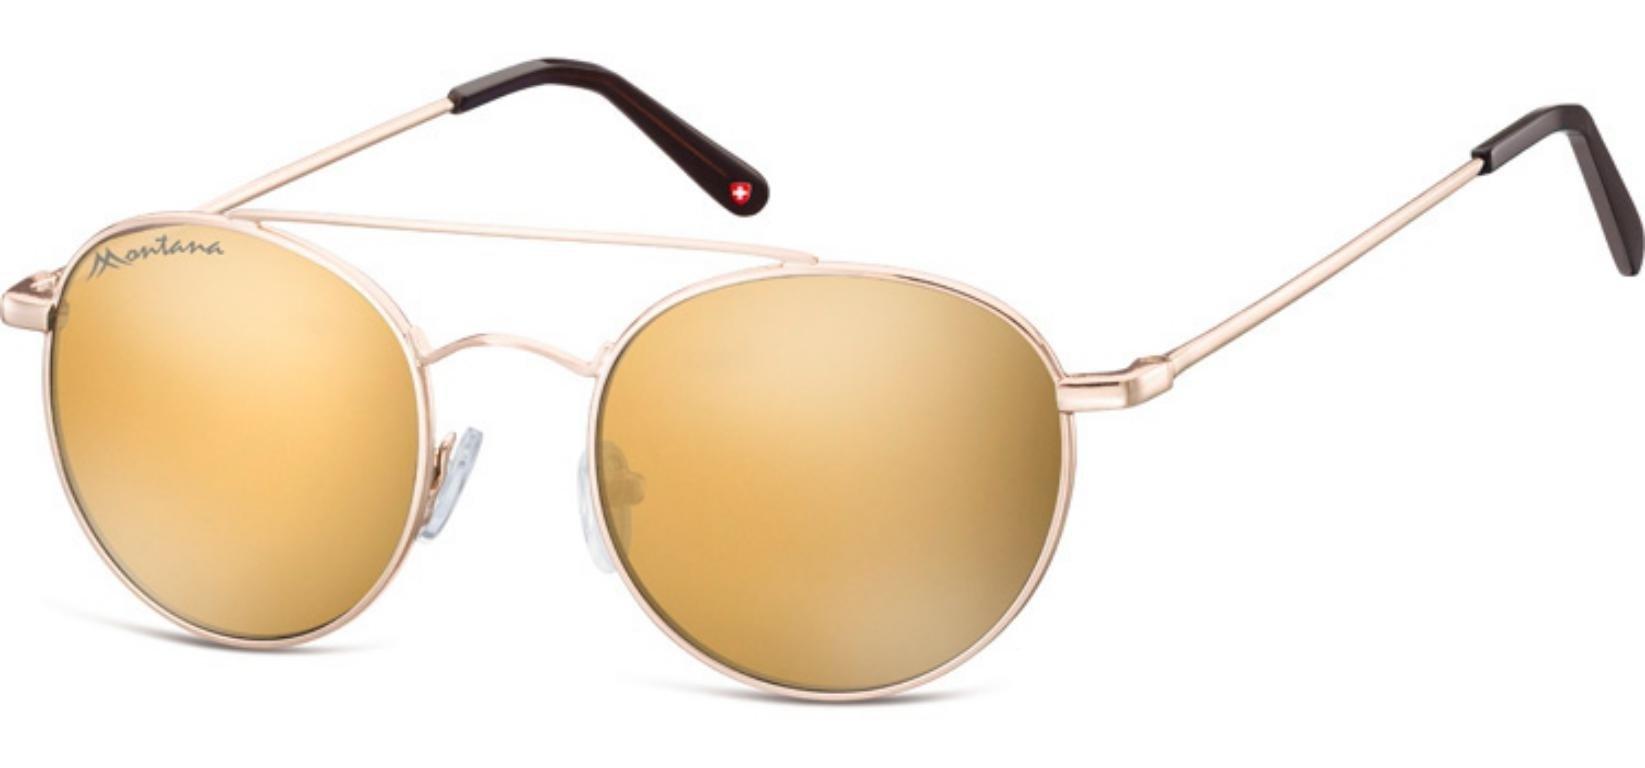 Montana Eyewear MS91-Grau-Blue Revo 6DS1gT